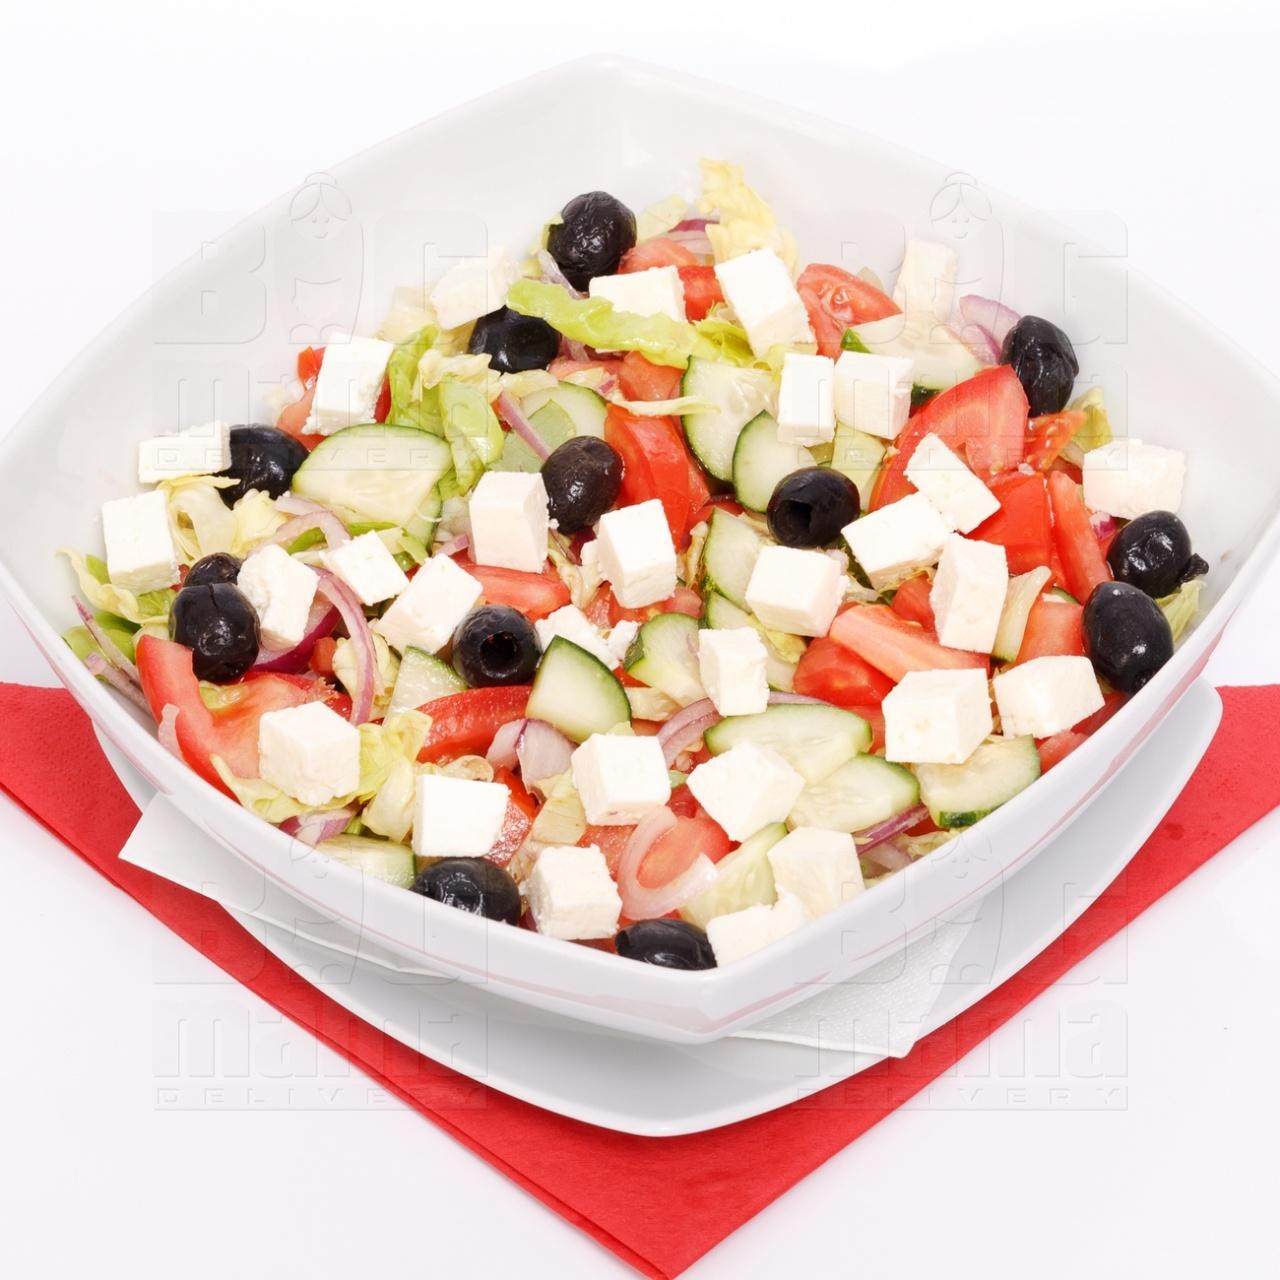 Product #30 image - Greek salad